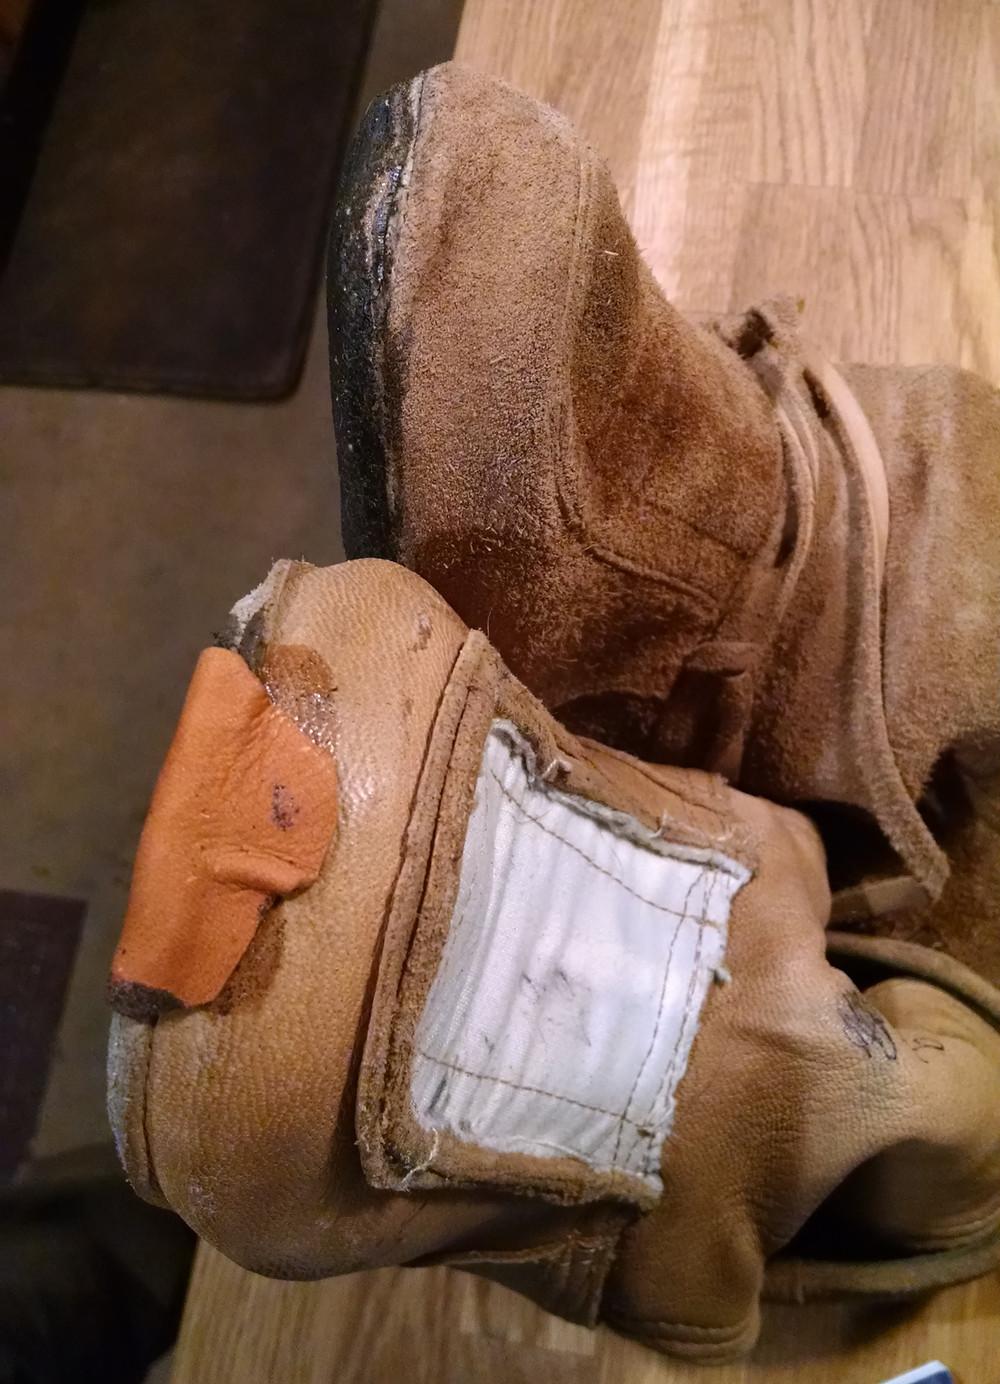 Toe patch